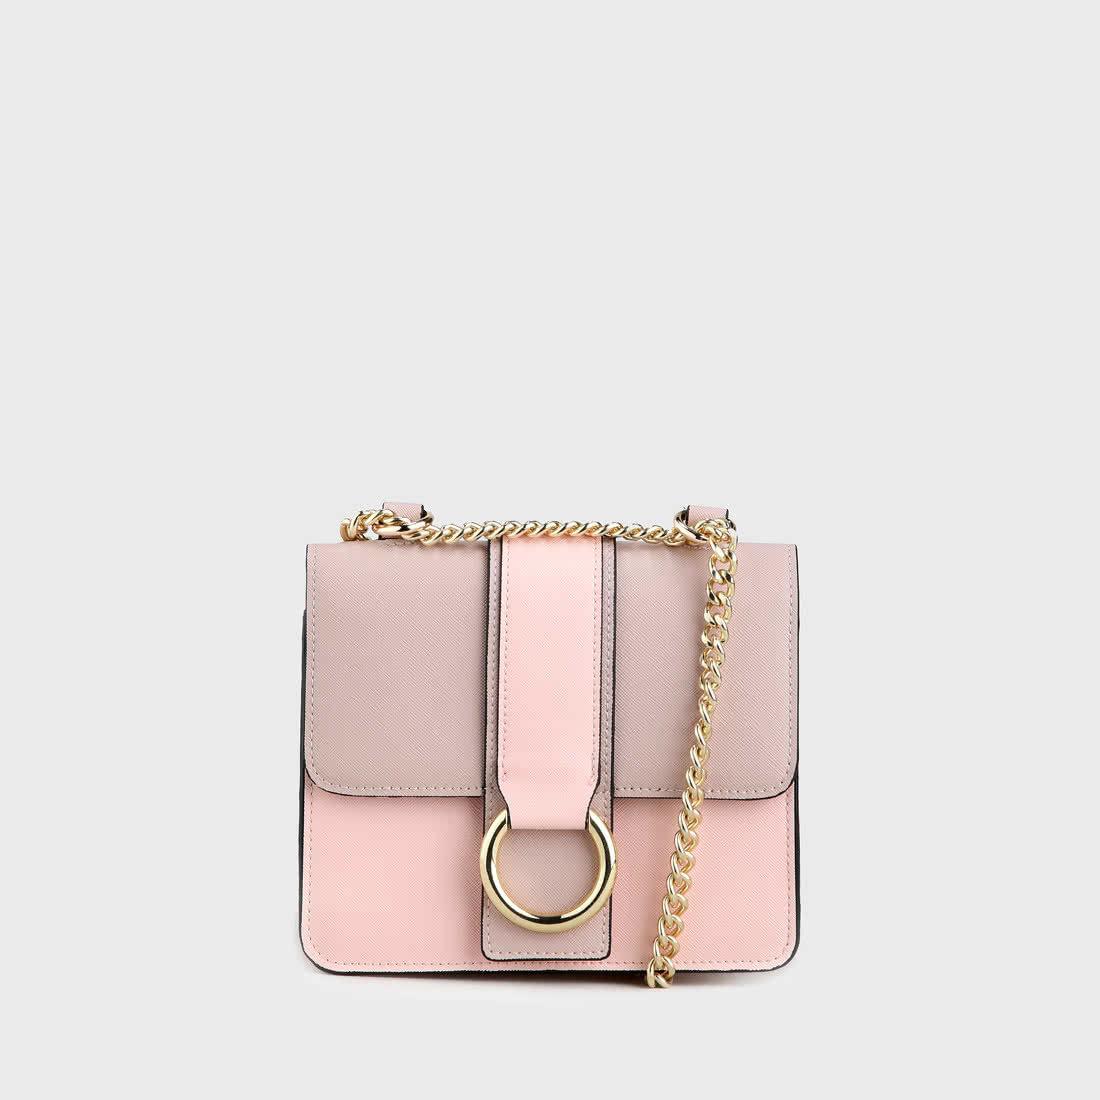 ae5ebbadd Cynthia Crossbody Bag leather look nude pink buy online in BUFFALO ...